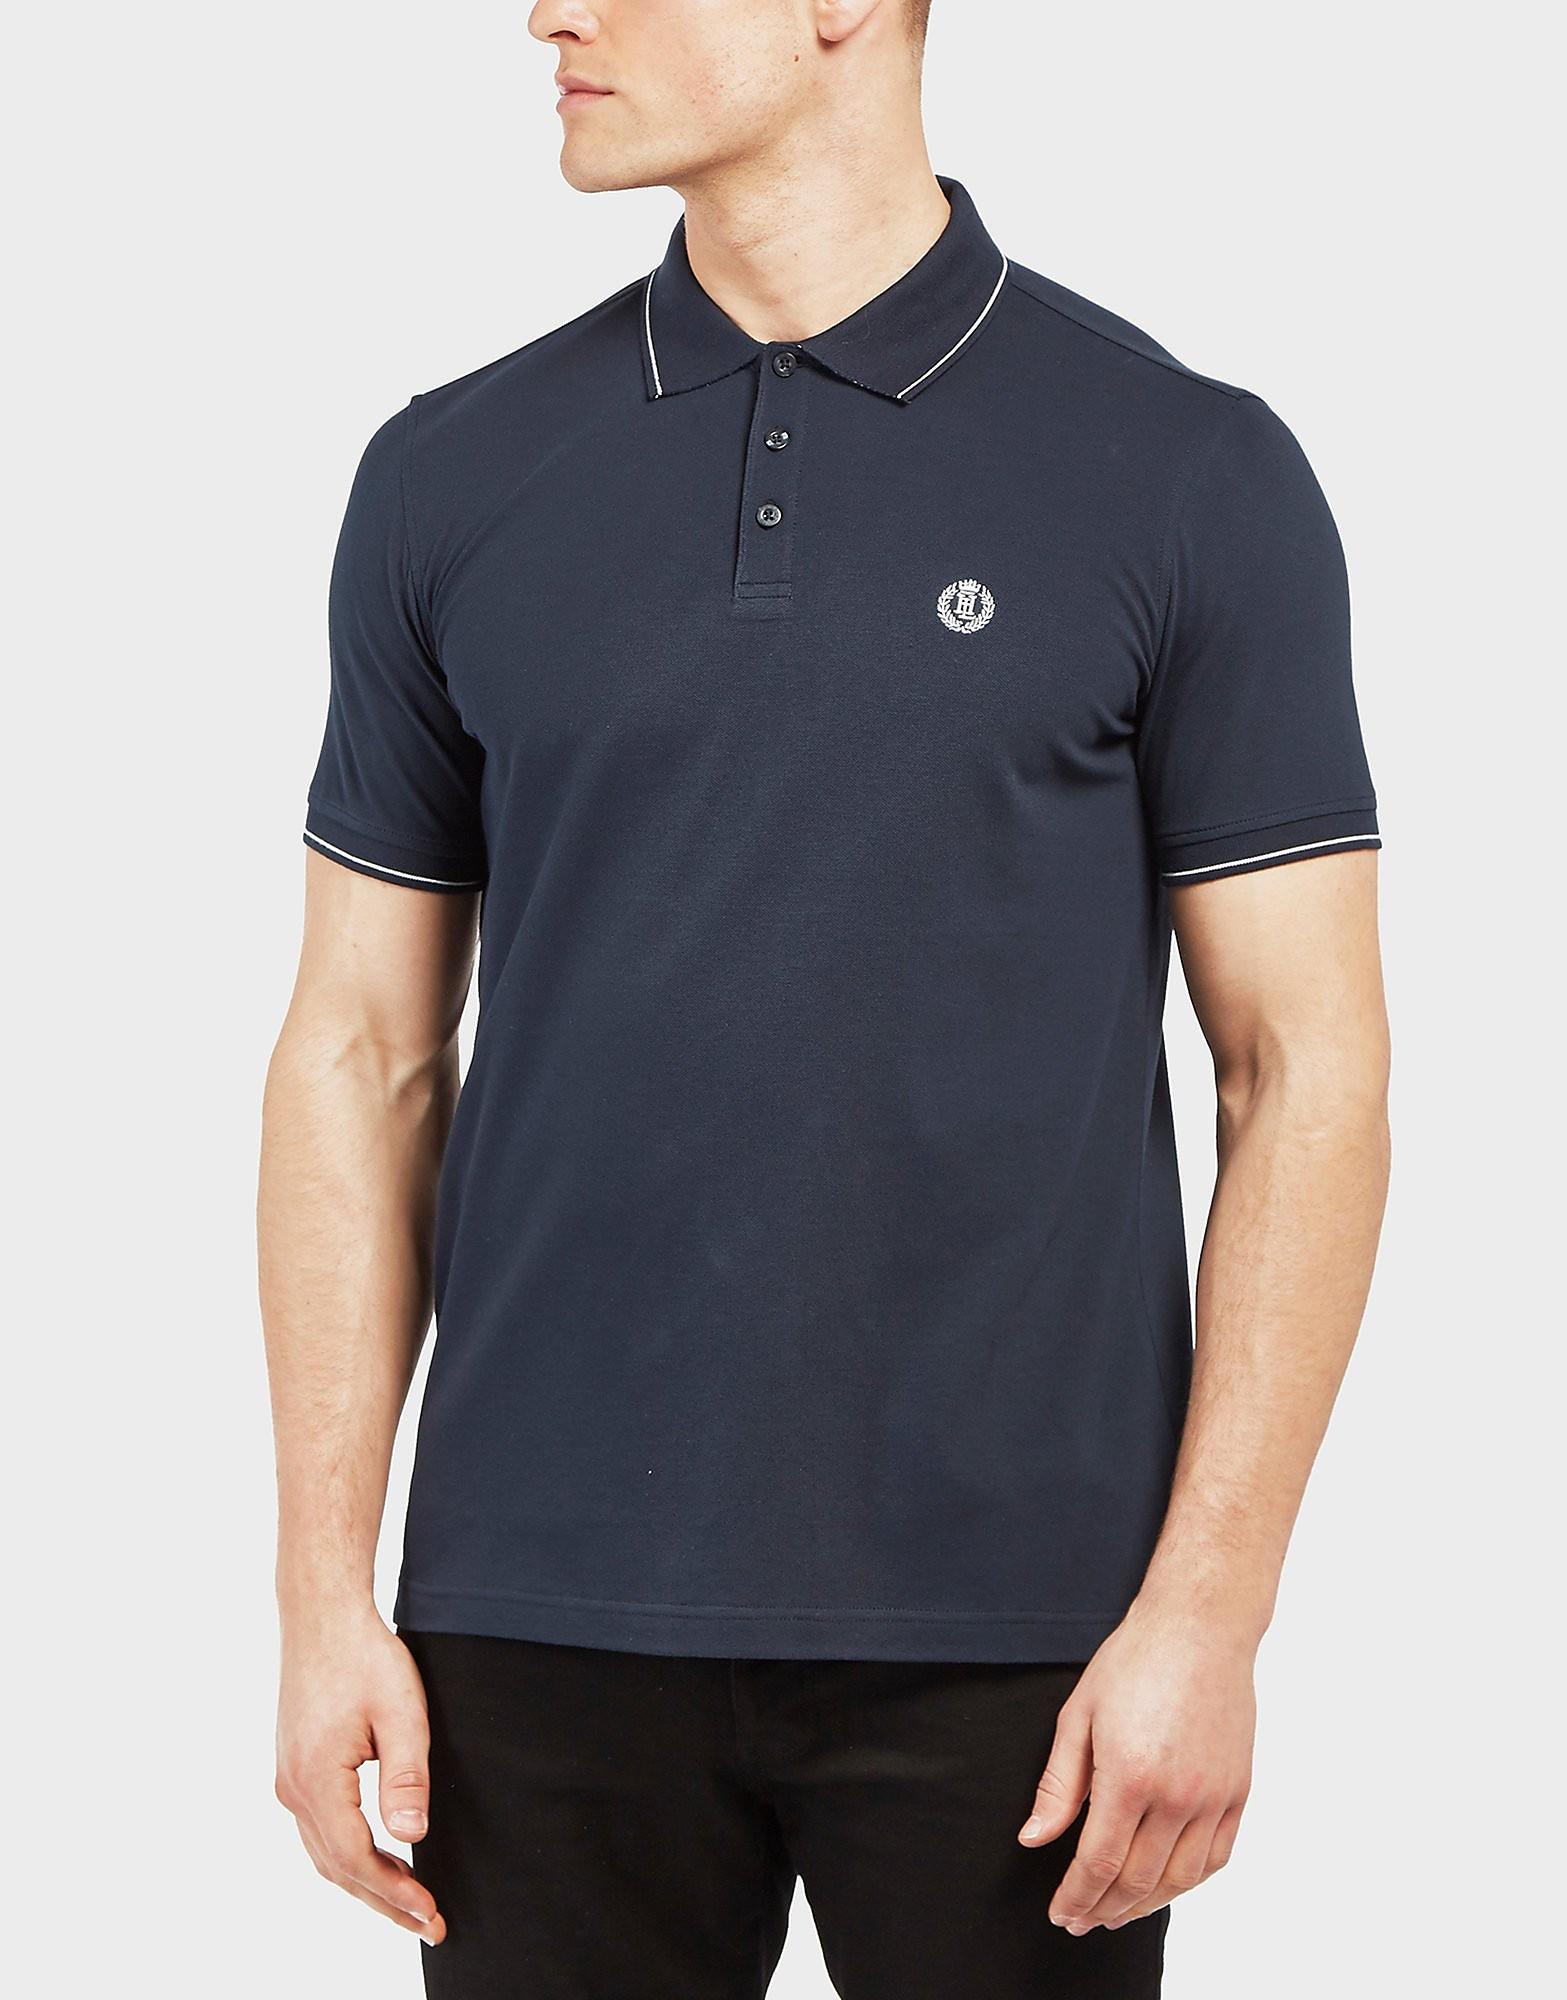 Henri Lloyd Abington Tipped Short Sleeve Polo Shirt